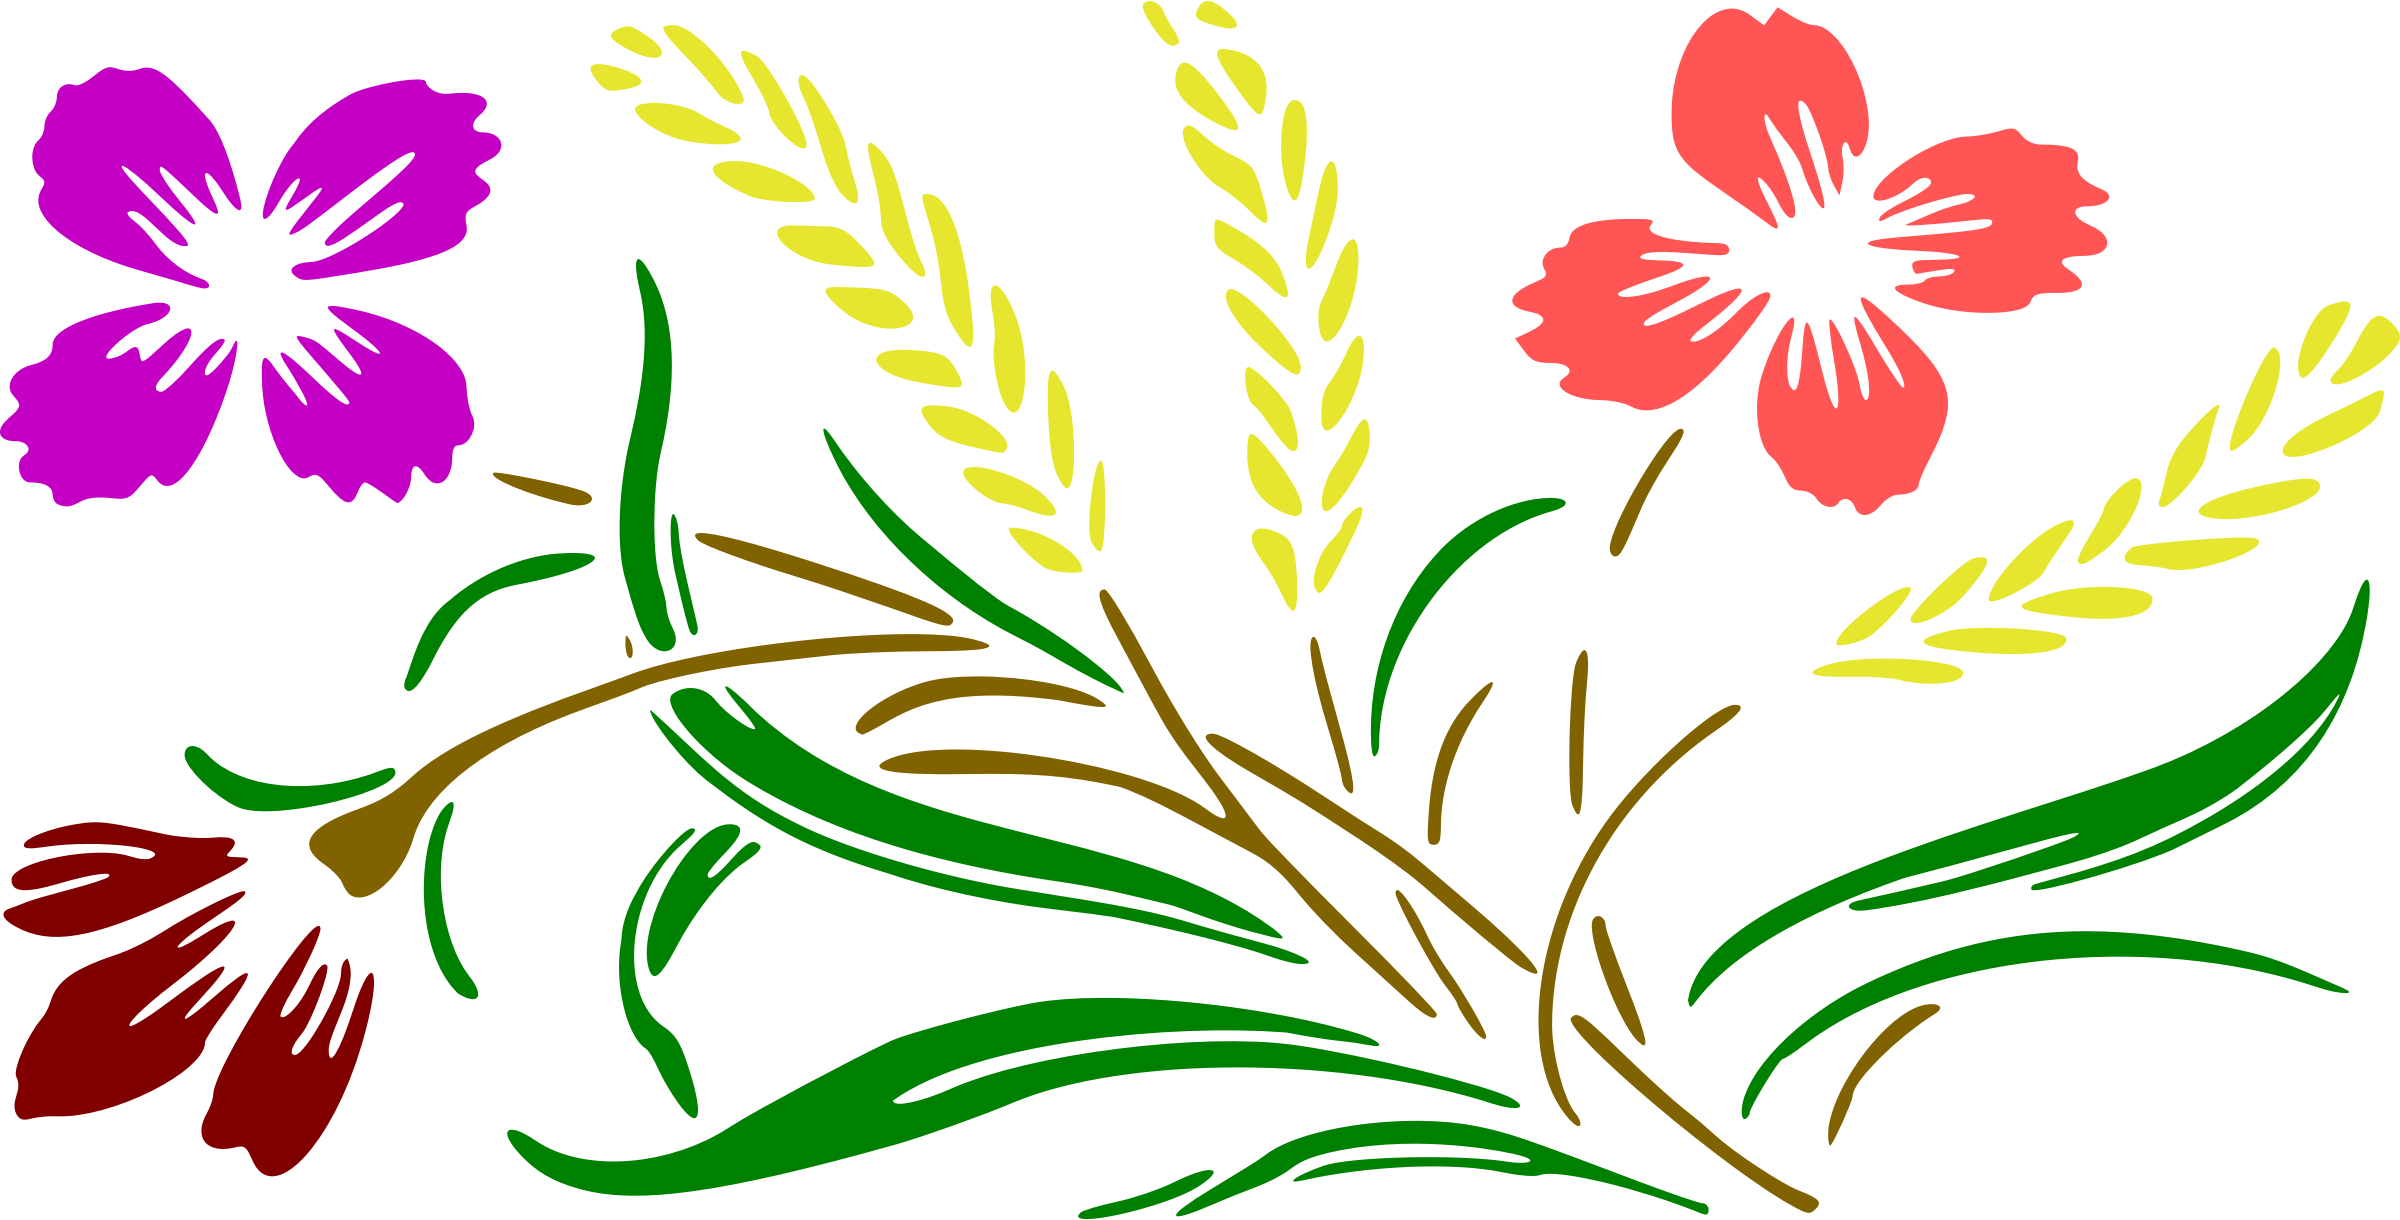 Clipart leaf floral. Design colour big image